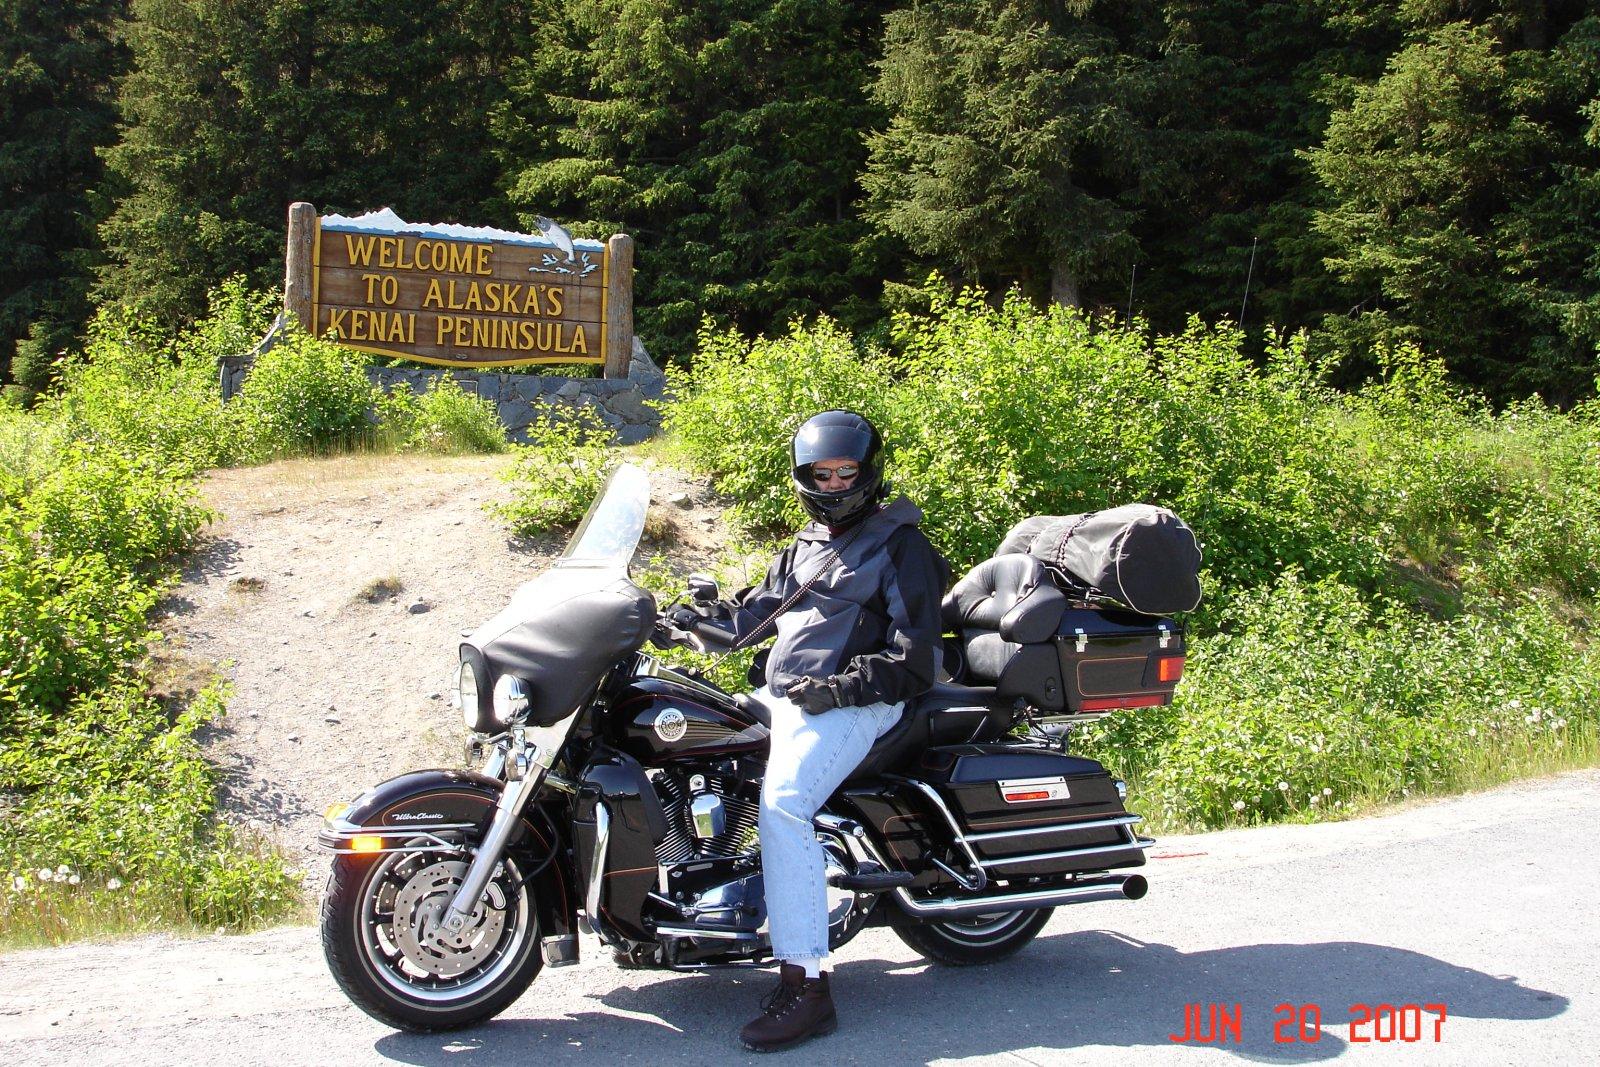 Click image for larger version  Name:Alaska 2007 054.jpg Views:60 Size:619.6 KB ID:113484